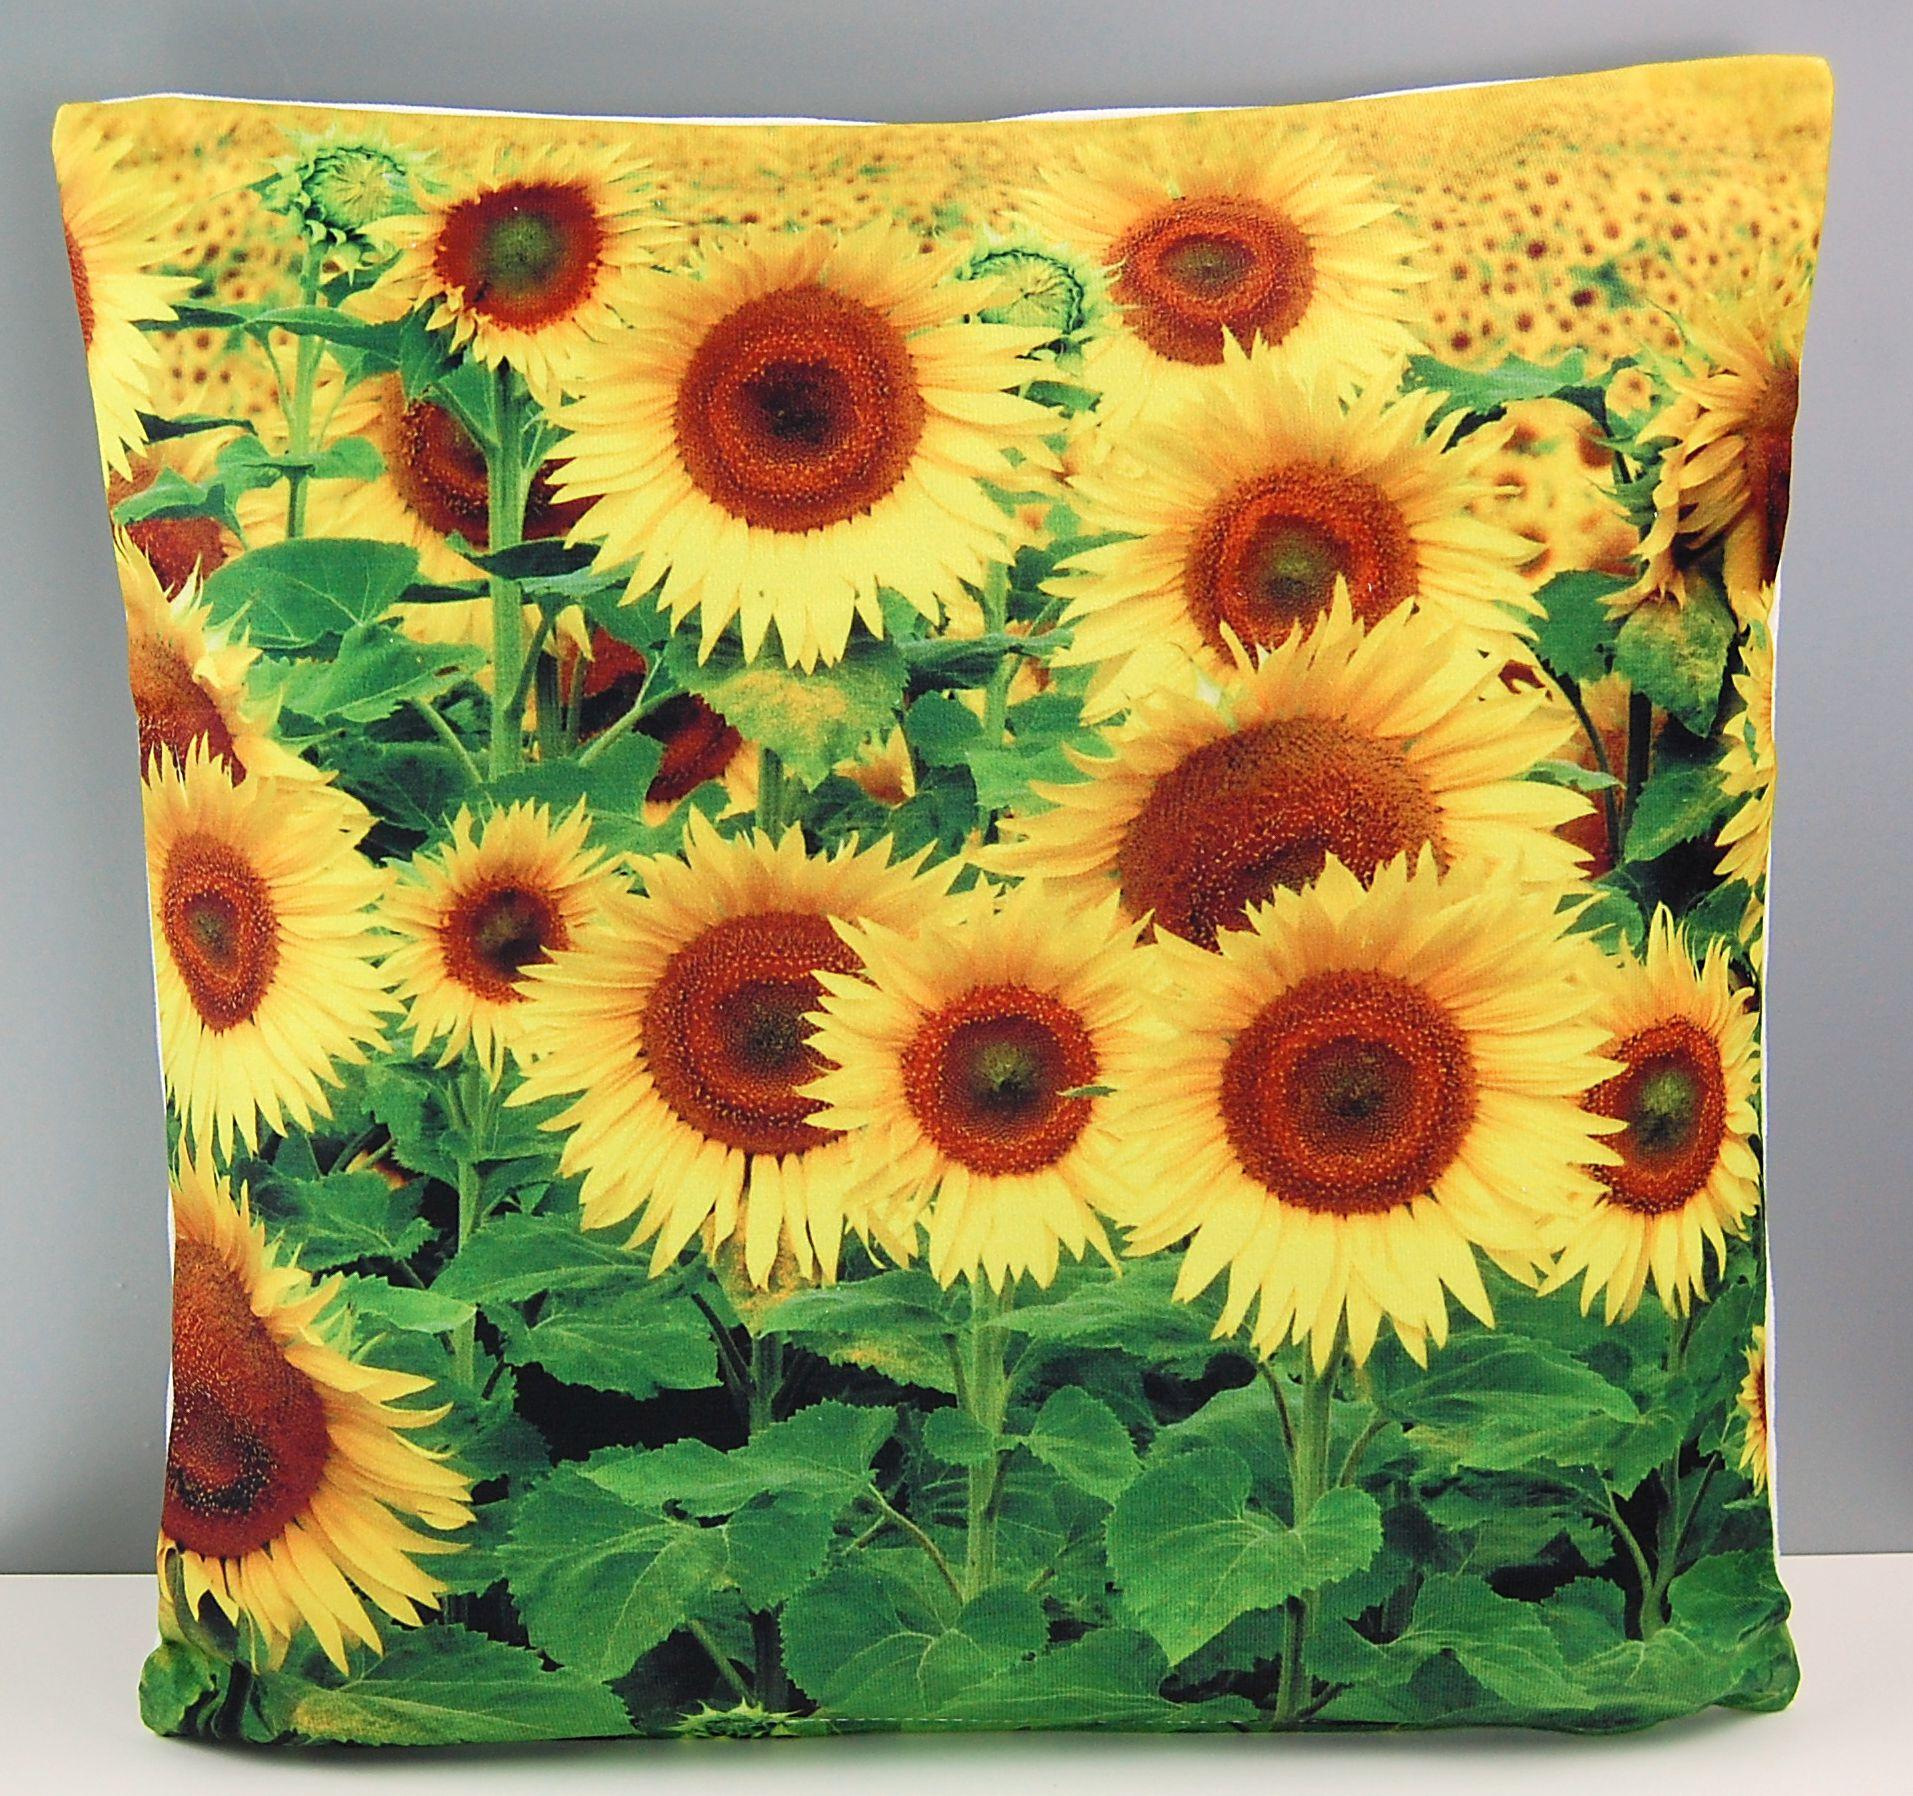 Kissenhuelle-40x40-cm-Kissenbezug-Foto-HERBST-Sofakissen-Kissen-Blaetter-Sunflower